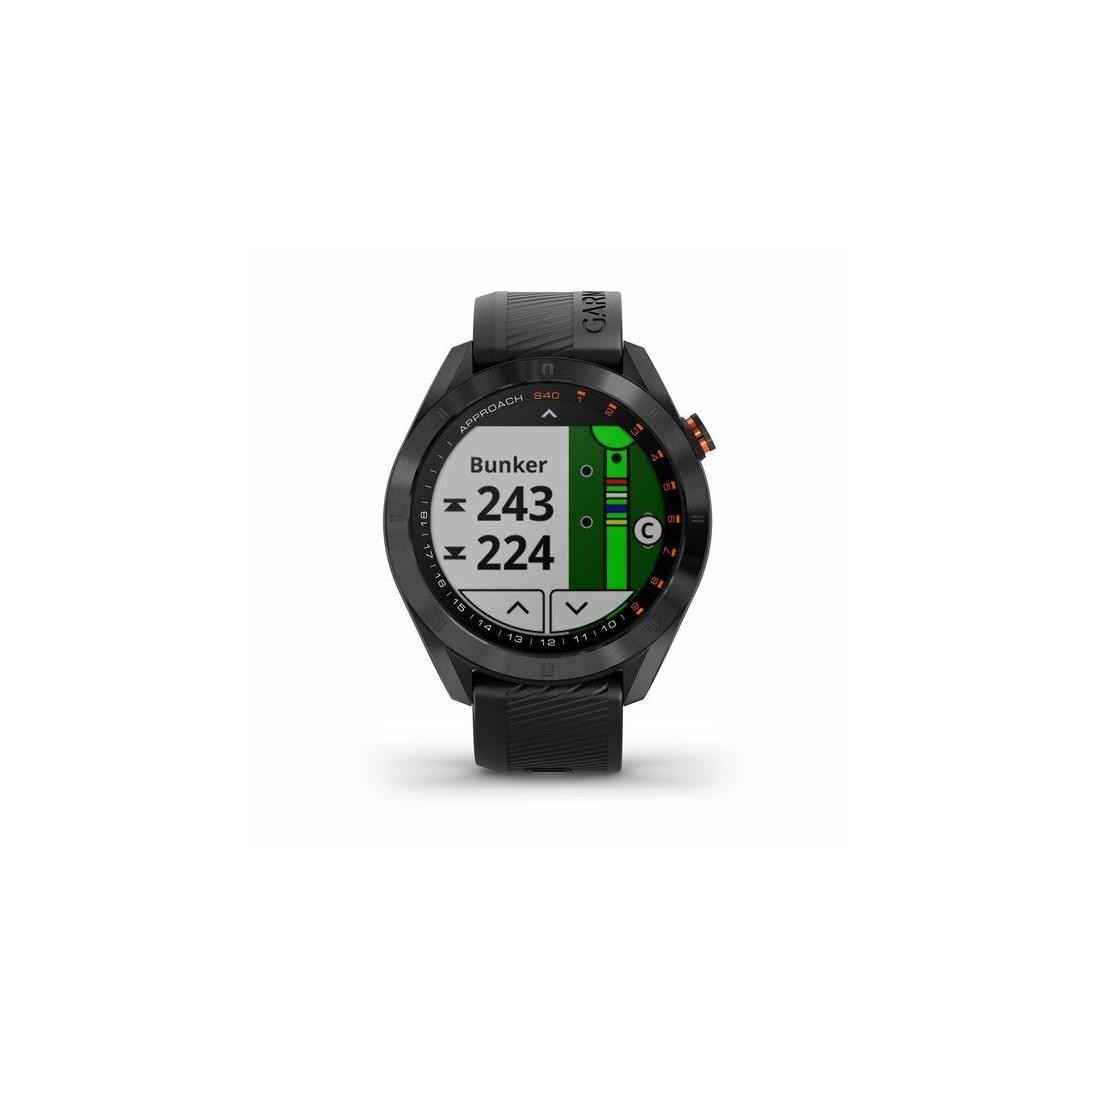 Garmin montre GPS S40 premium